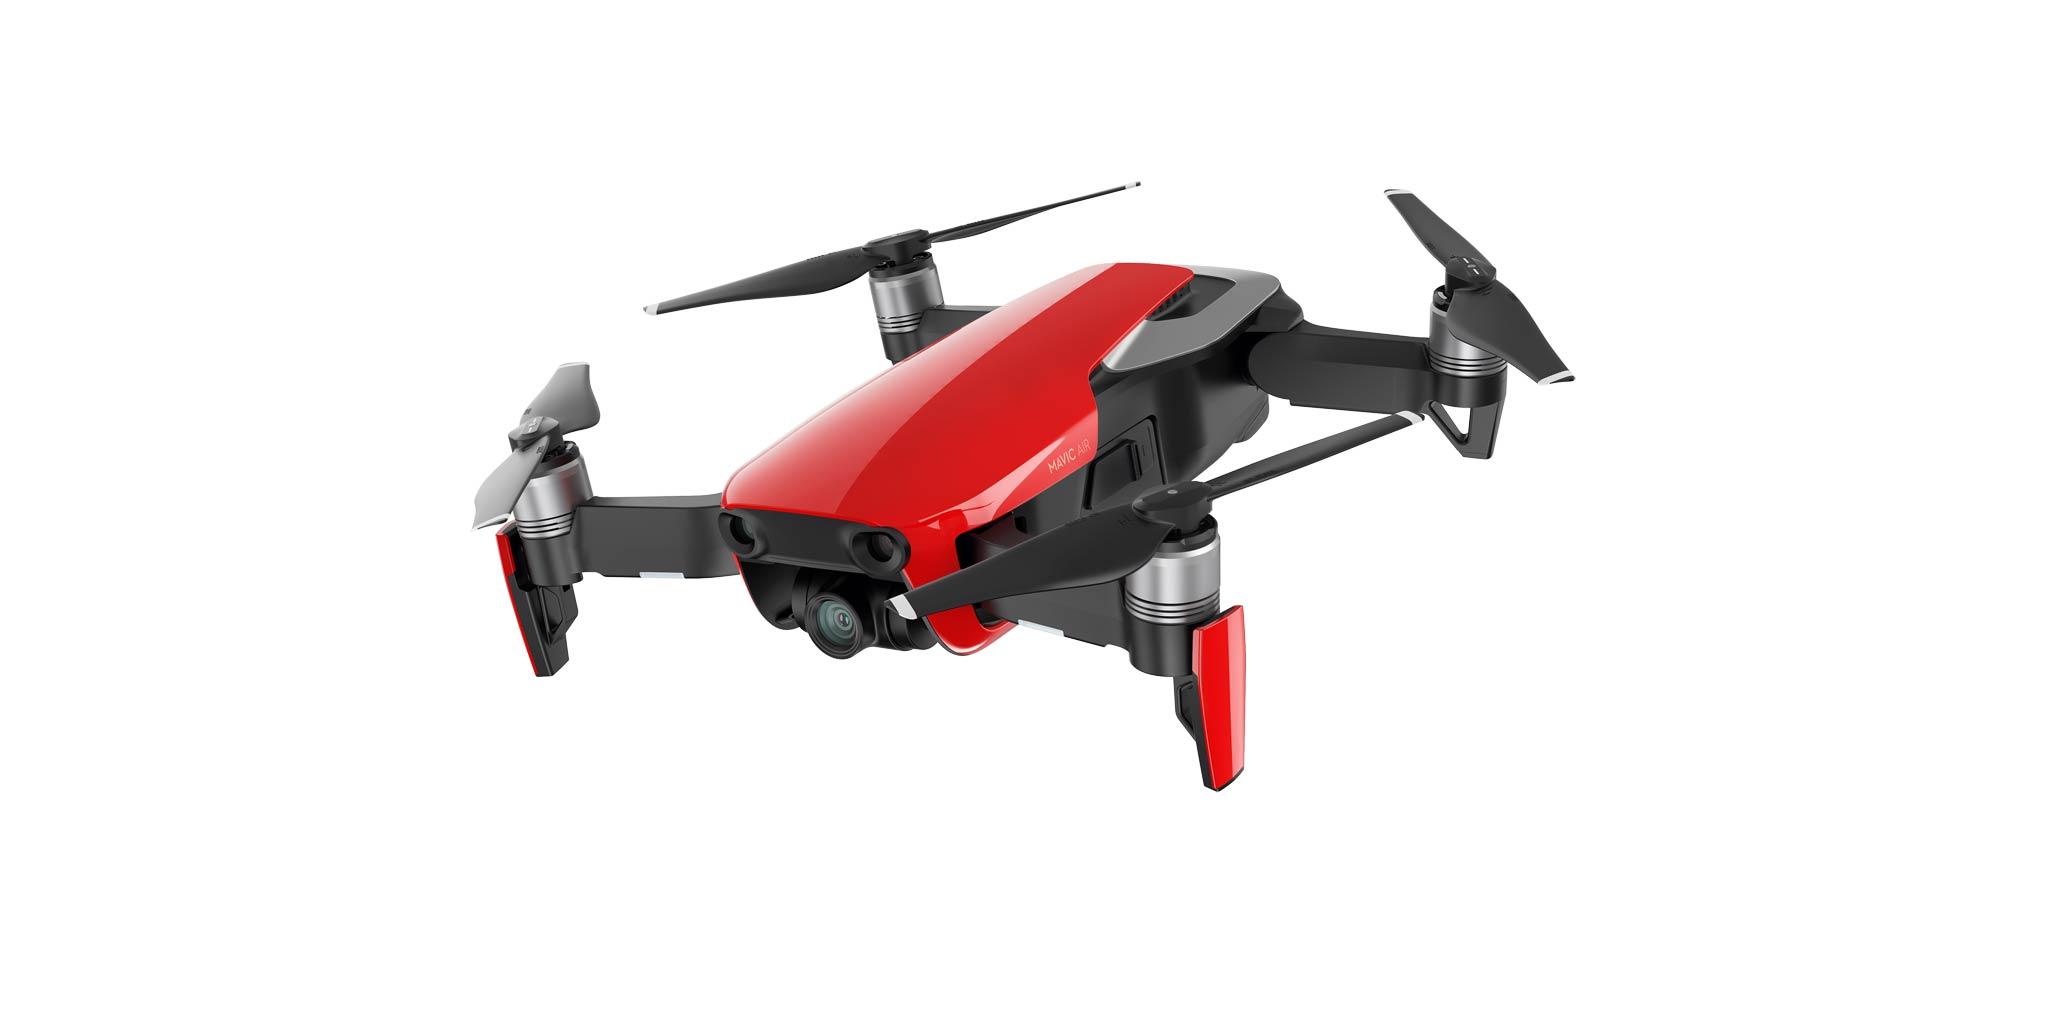 Die neue Mavic Air in der Farbe Rot